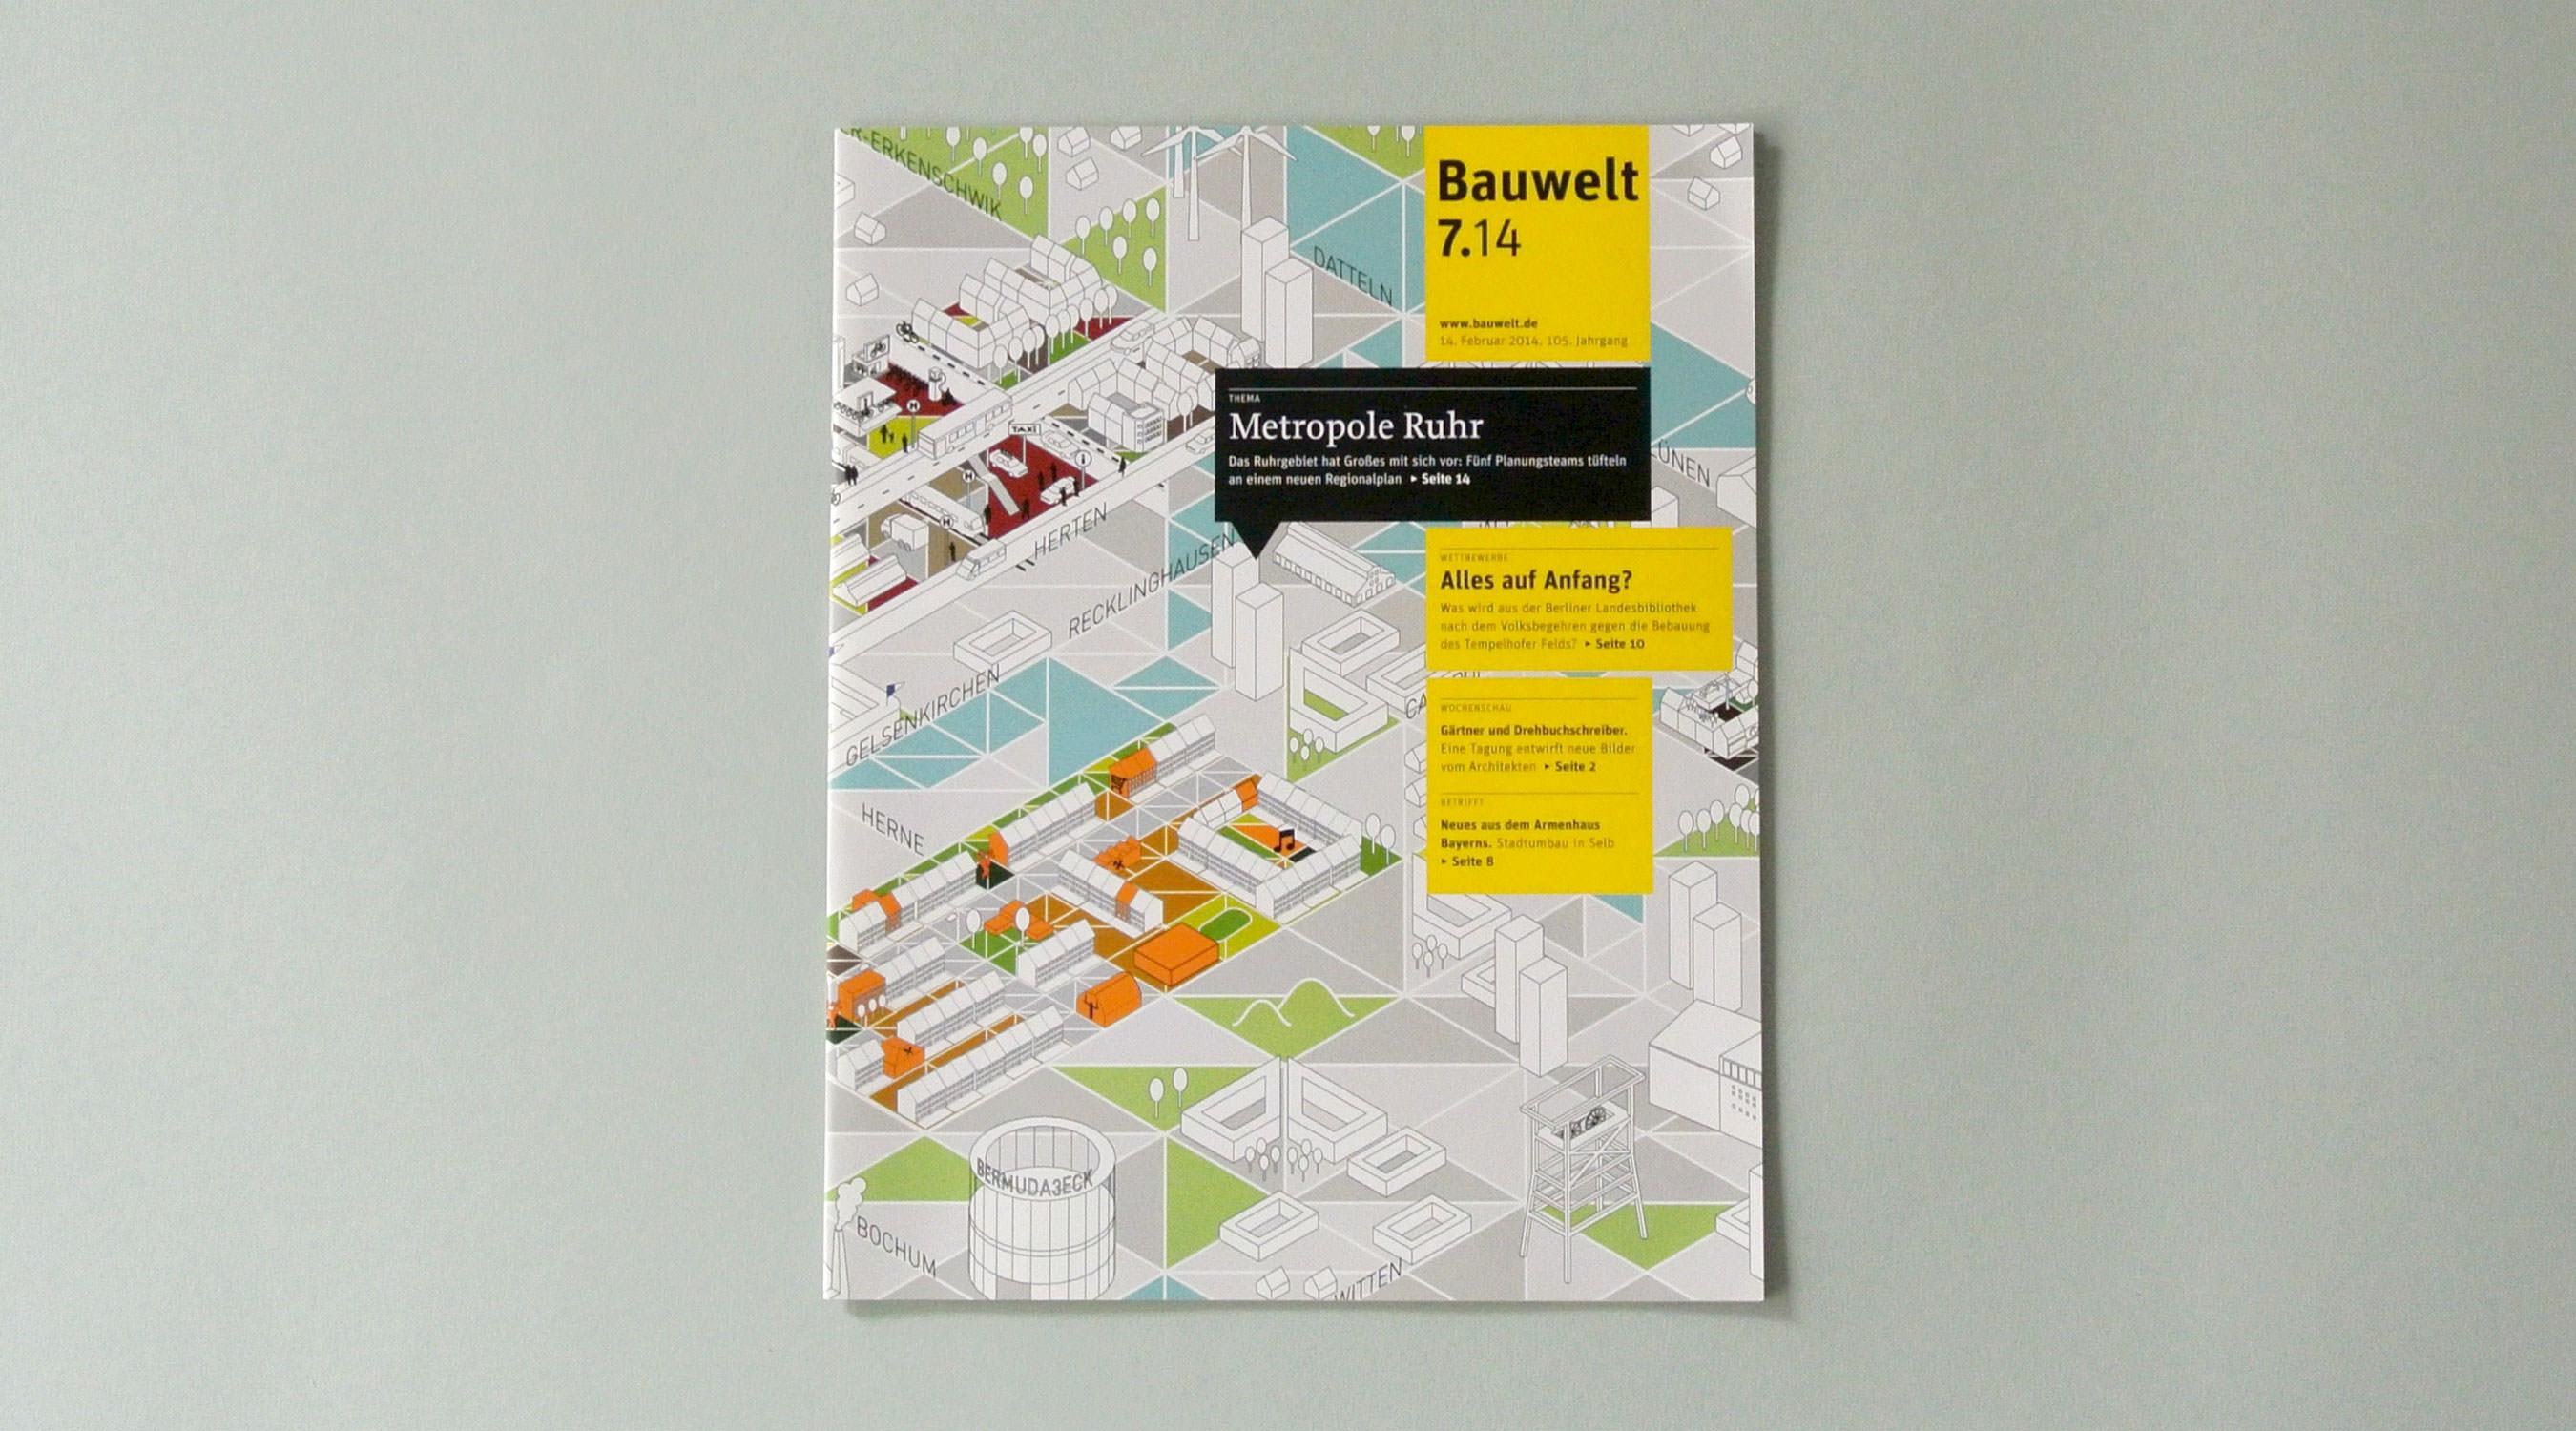 Bauwelt 7.14 Metropole Ruhr